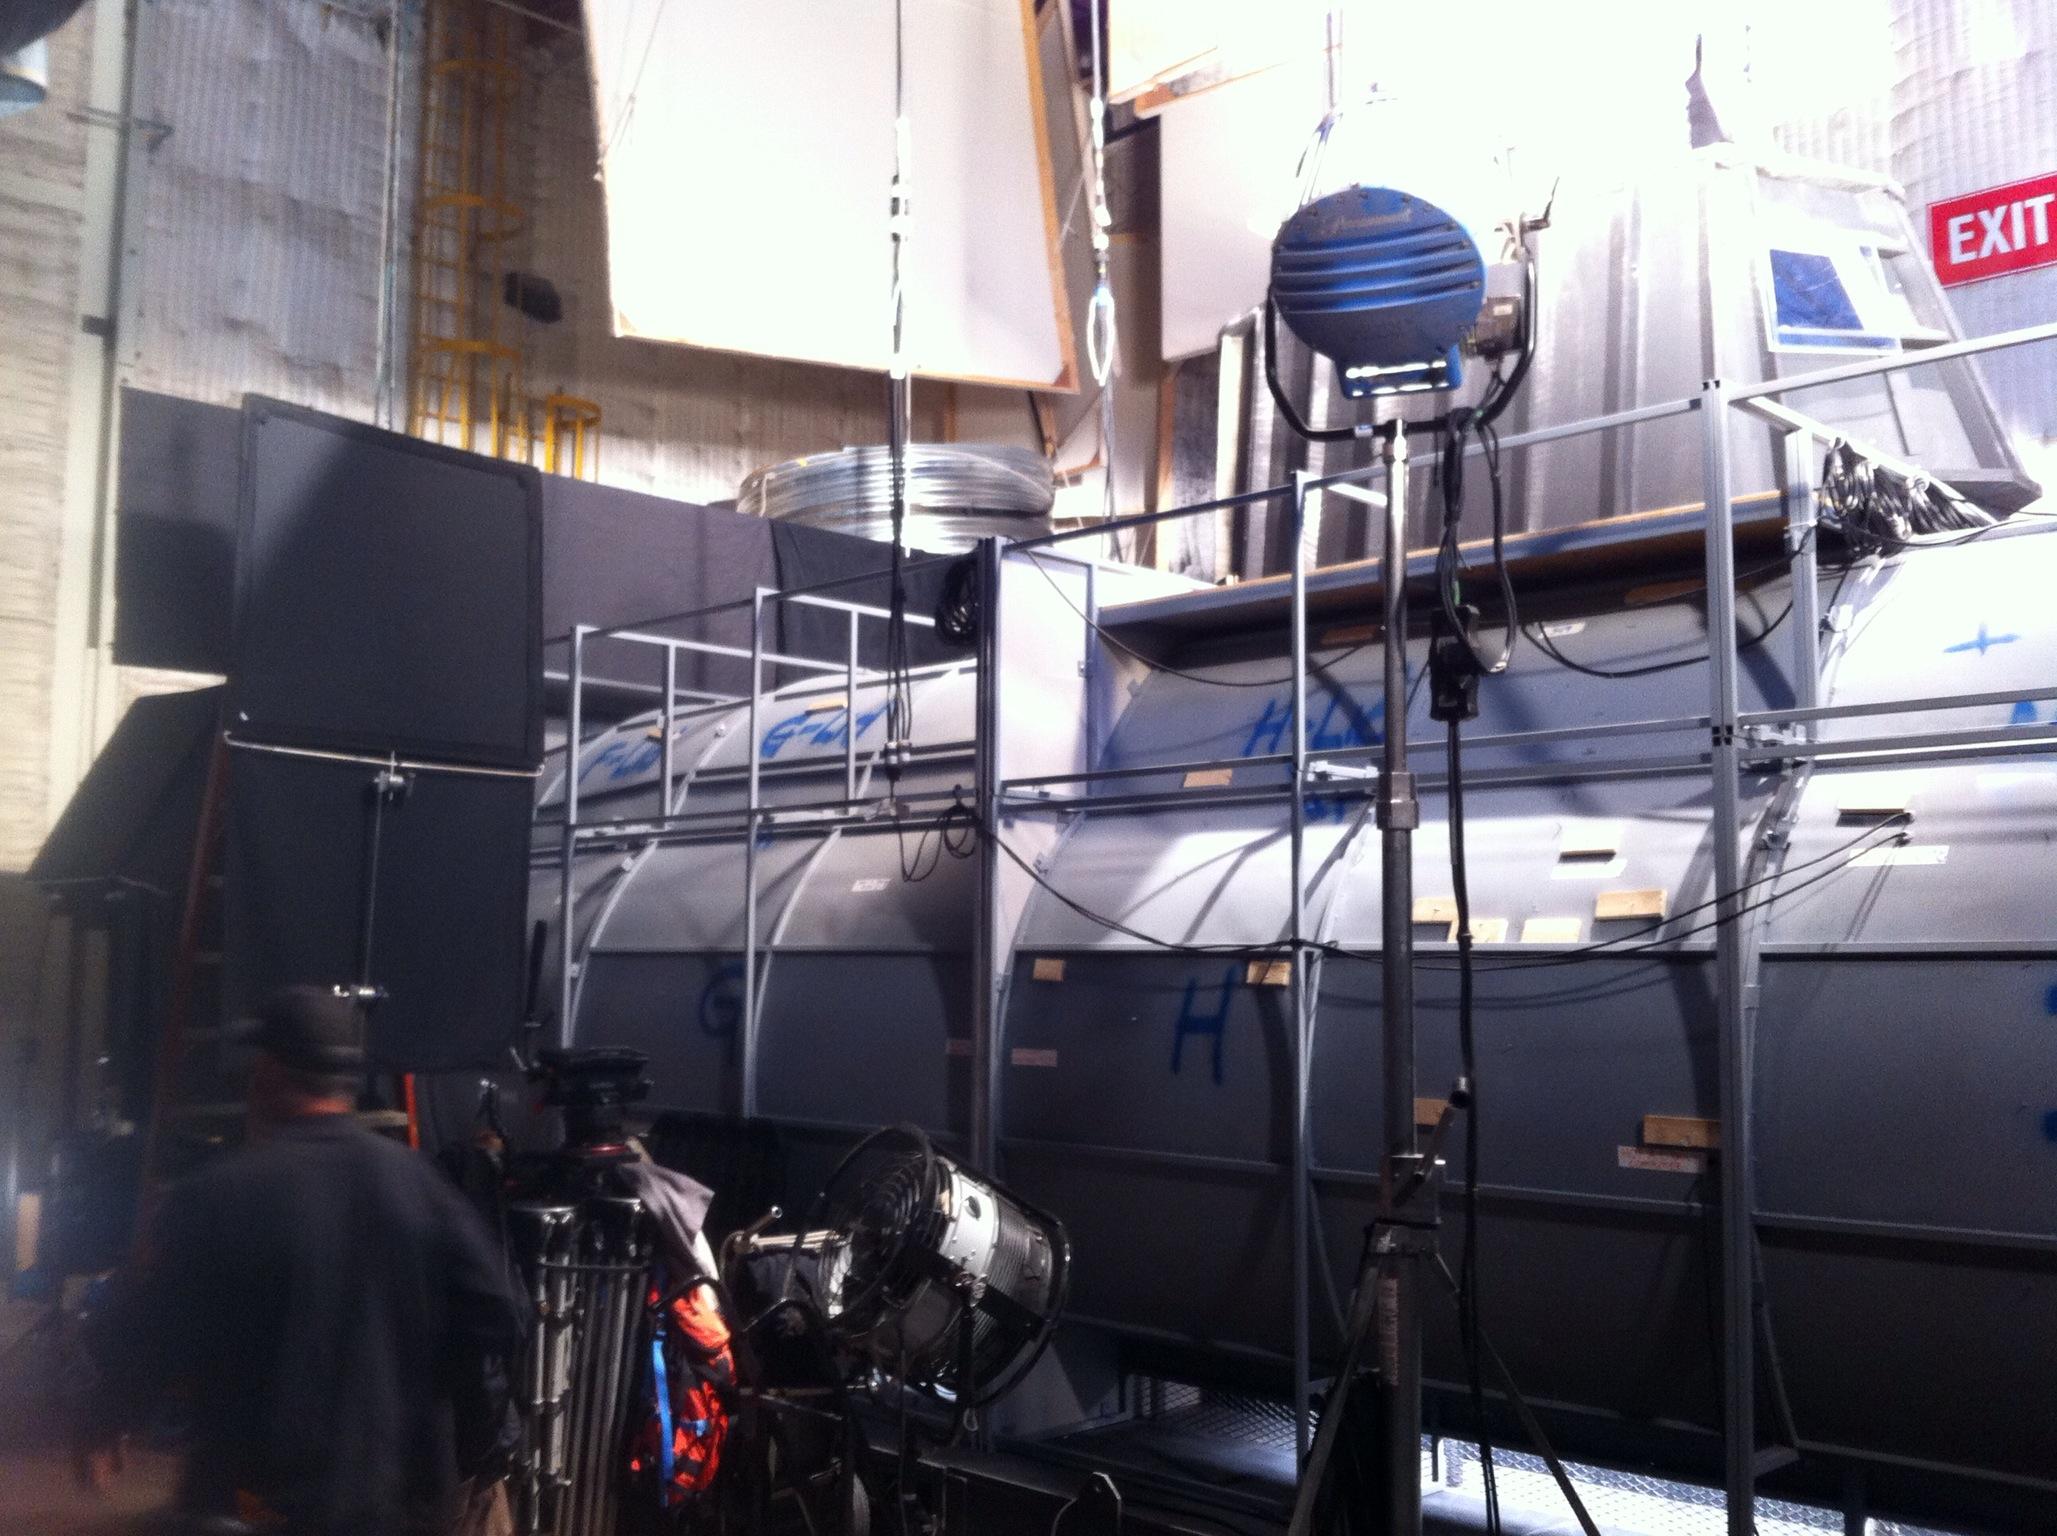 Season 6 Premiere Behind The Scenes - CBS SYNC